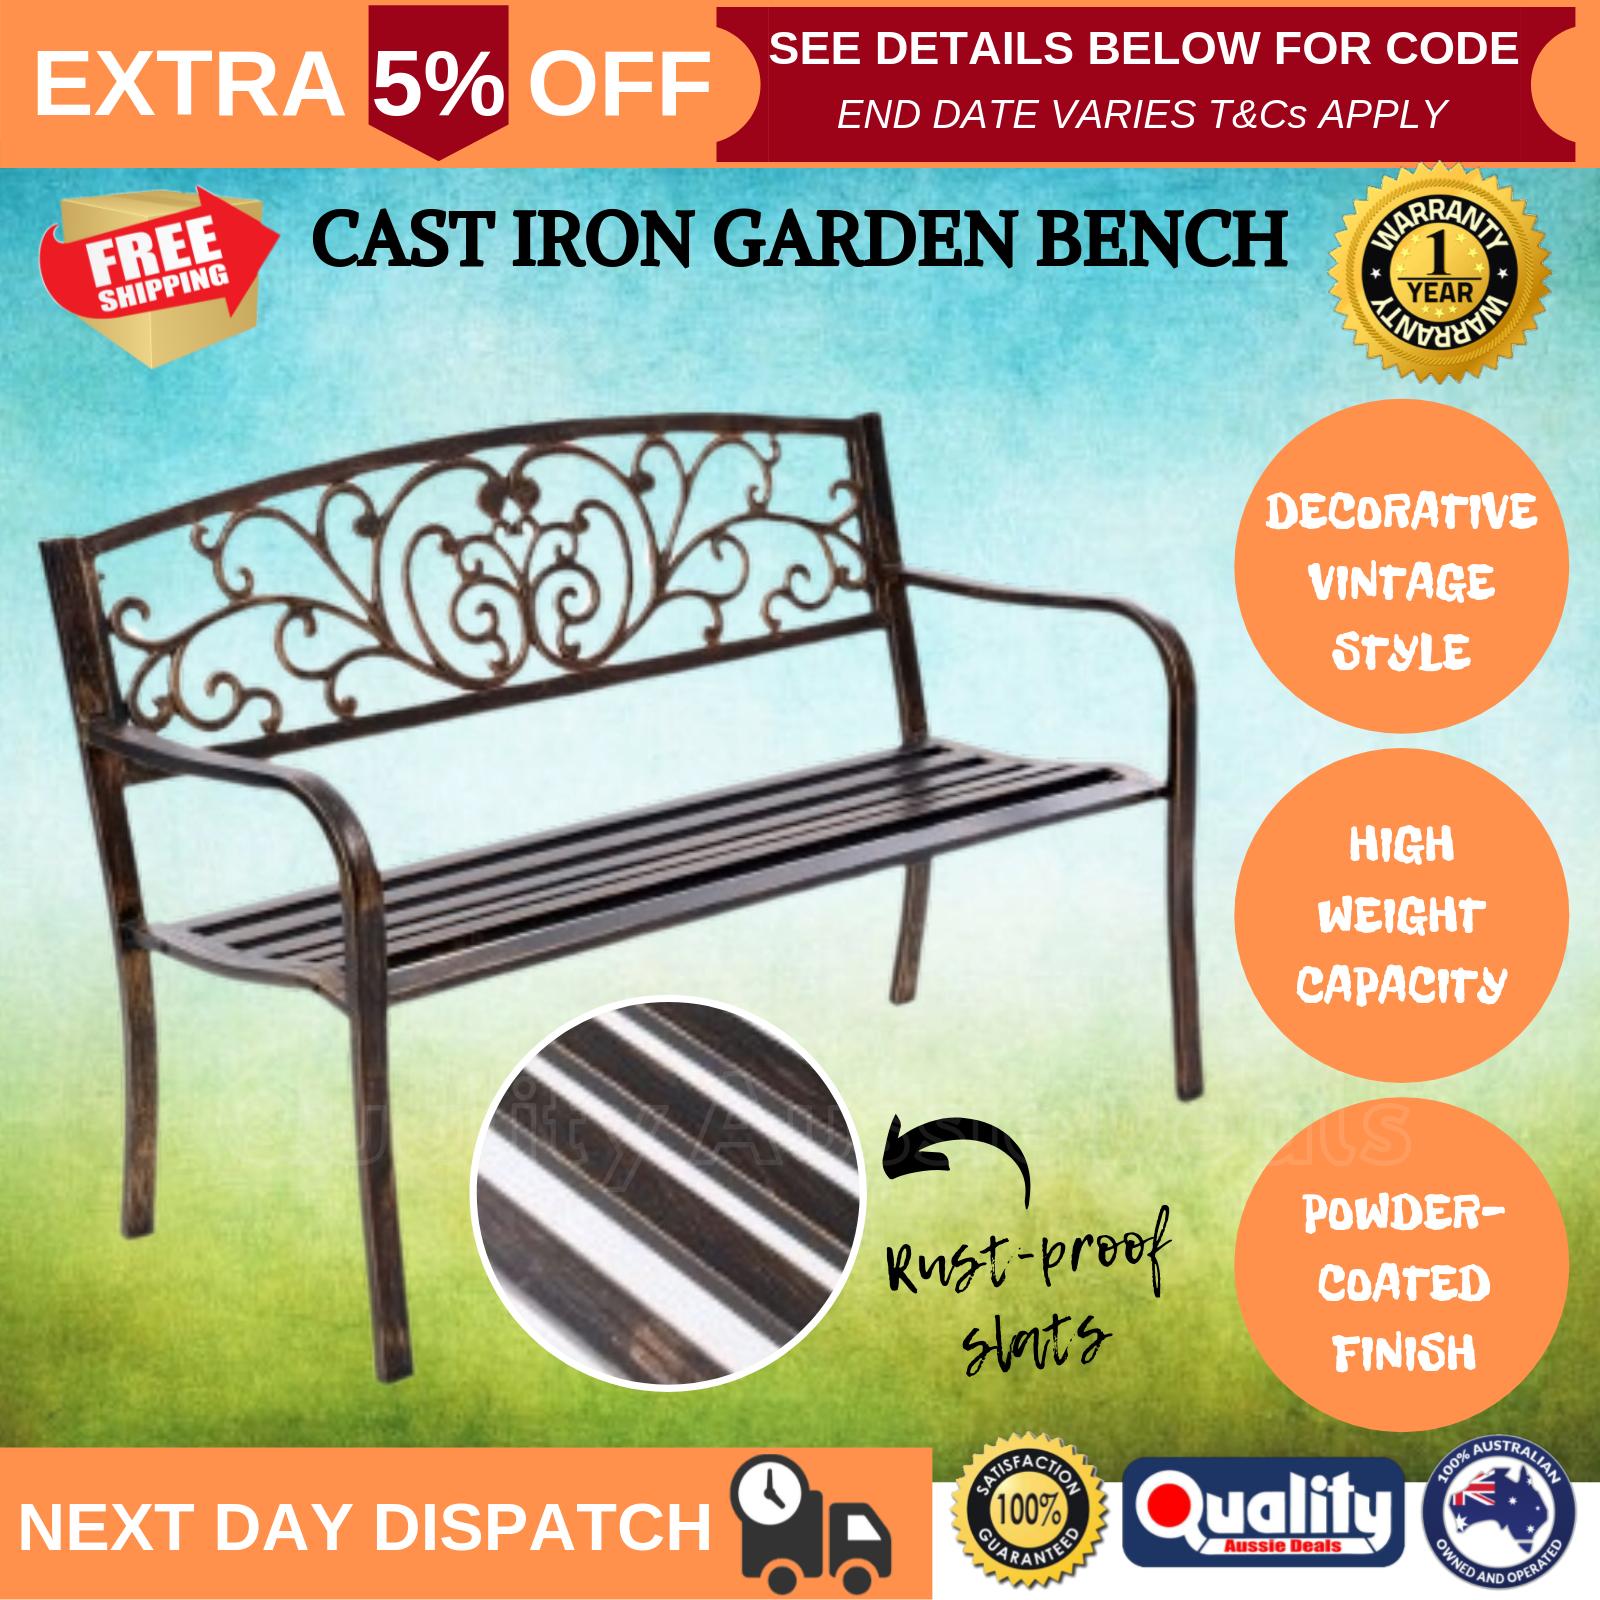 BCP 50in Outdoor Metal Patio Garden Bench Furniture Decor w// Verdi Floral Design